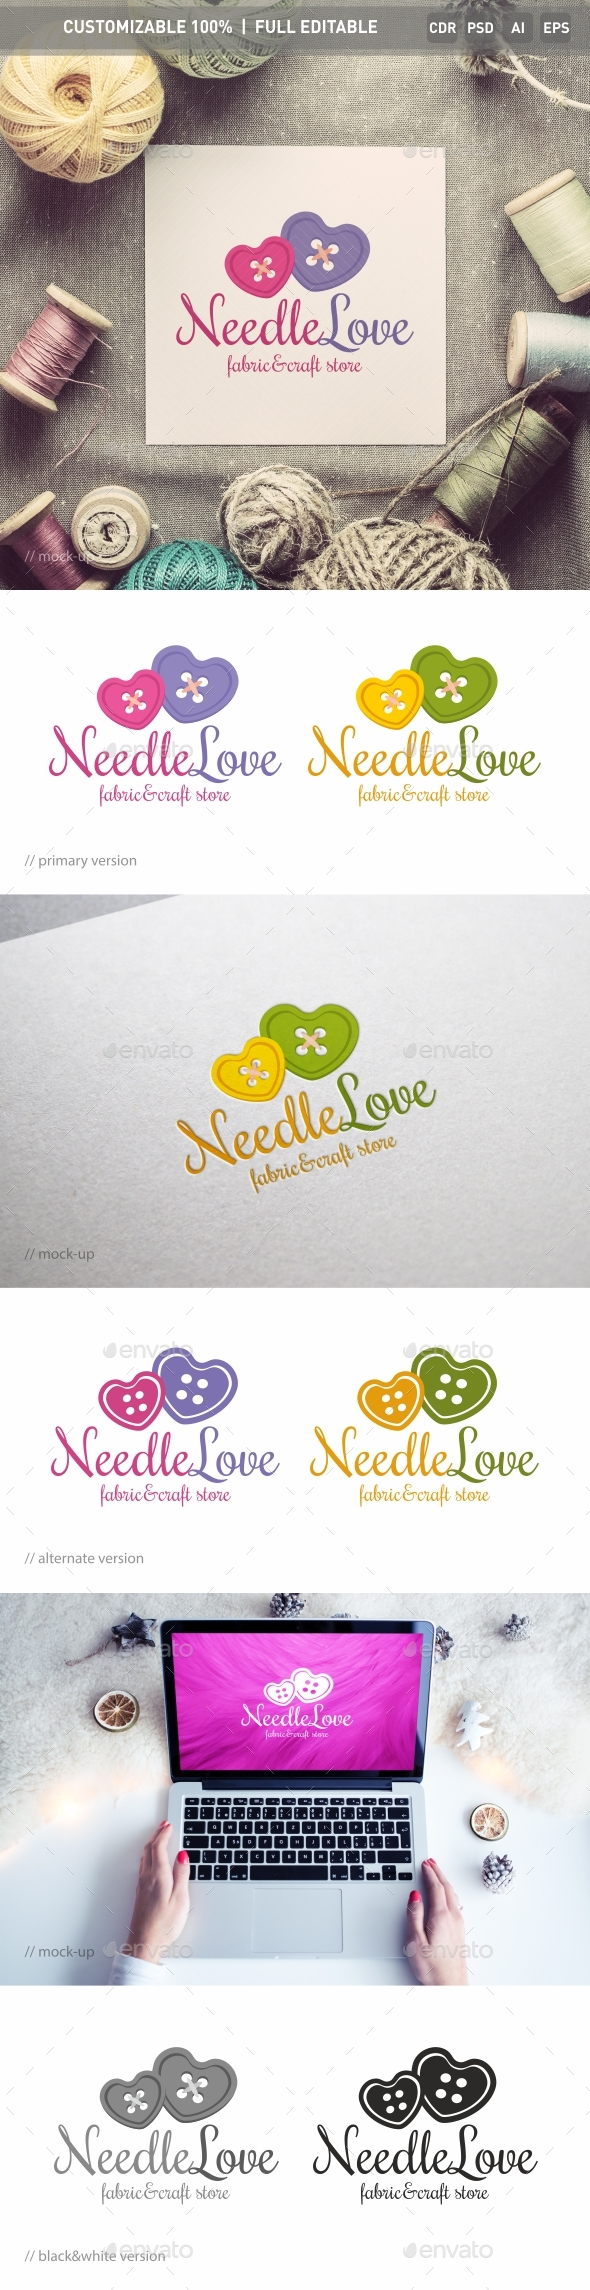 NeedleLove Logo Template